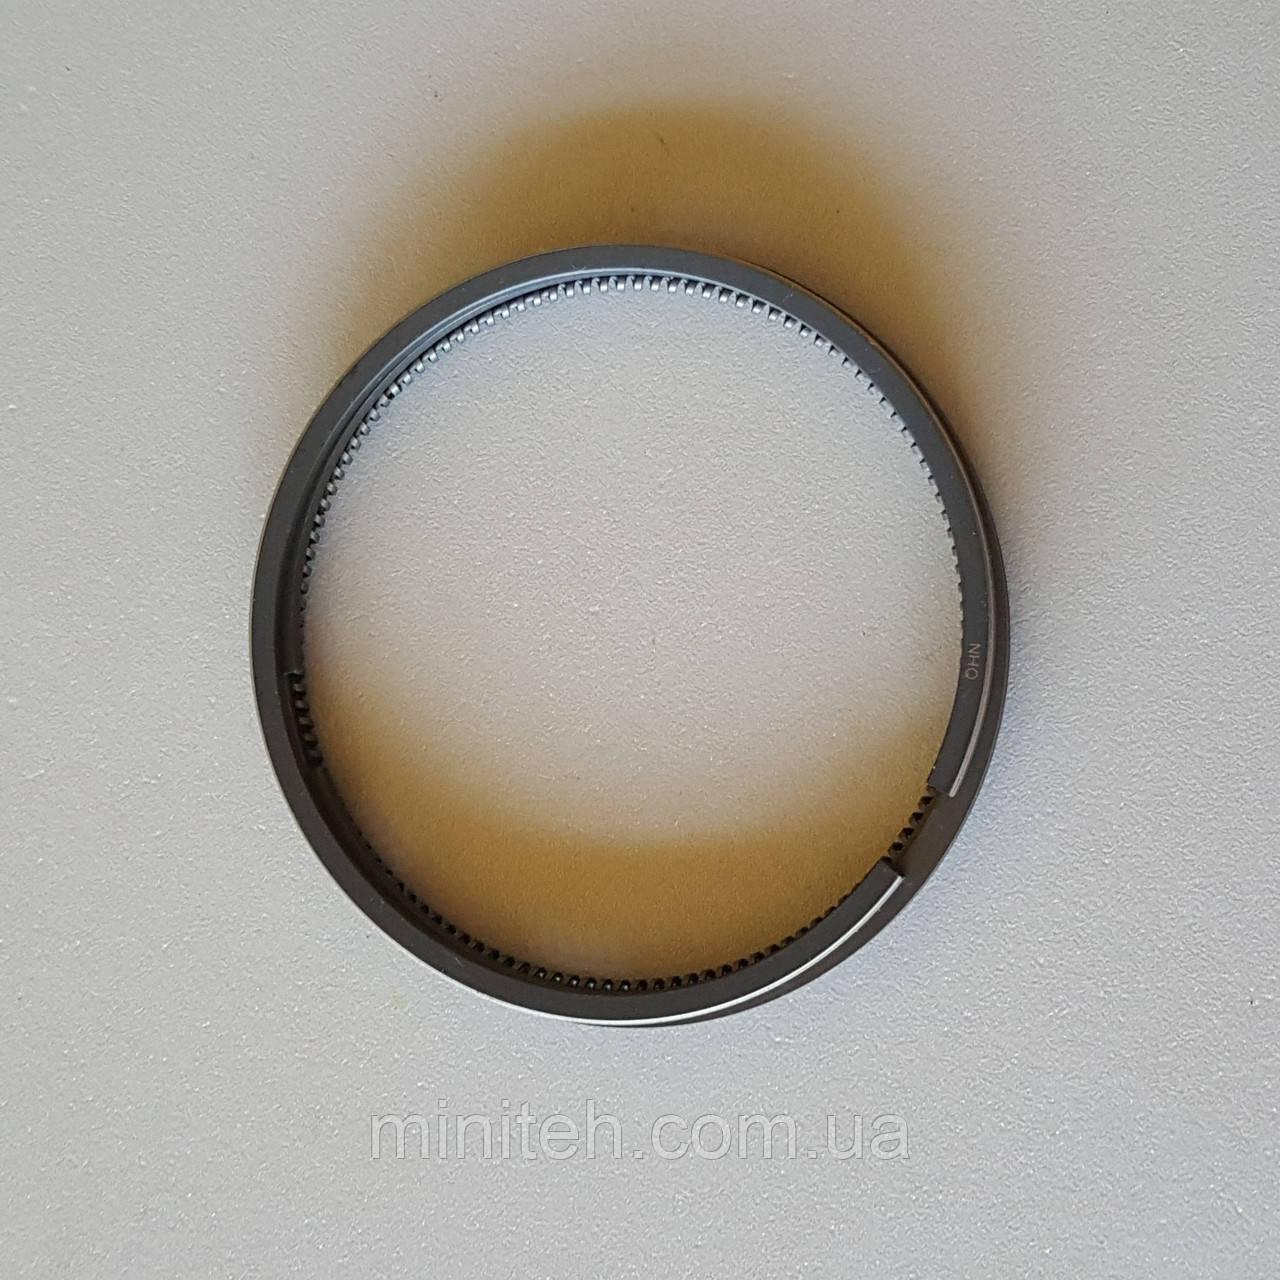 Кільця поршневі дв. КМ-385 Вт (на 1 поршень)